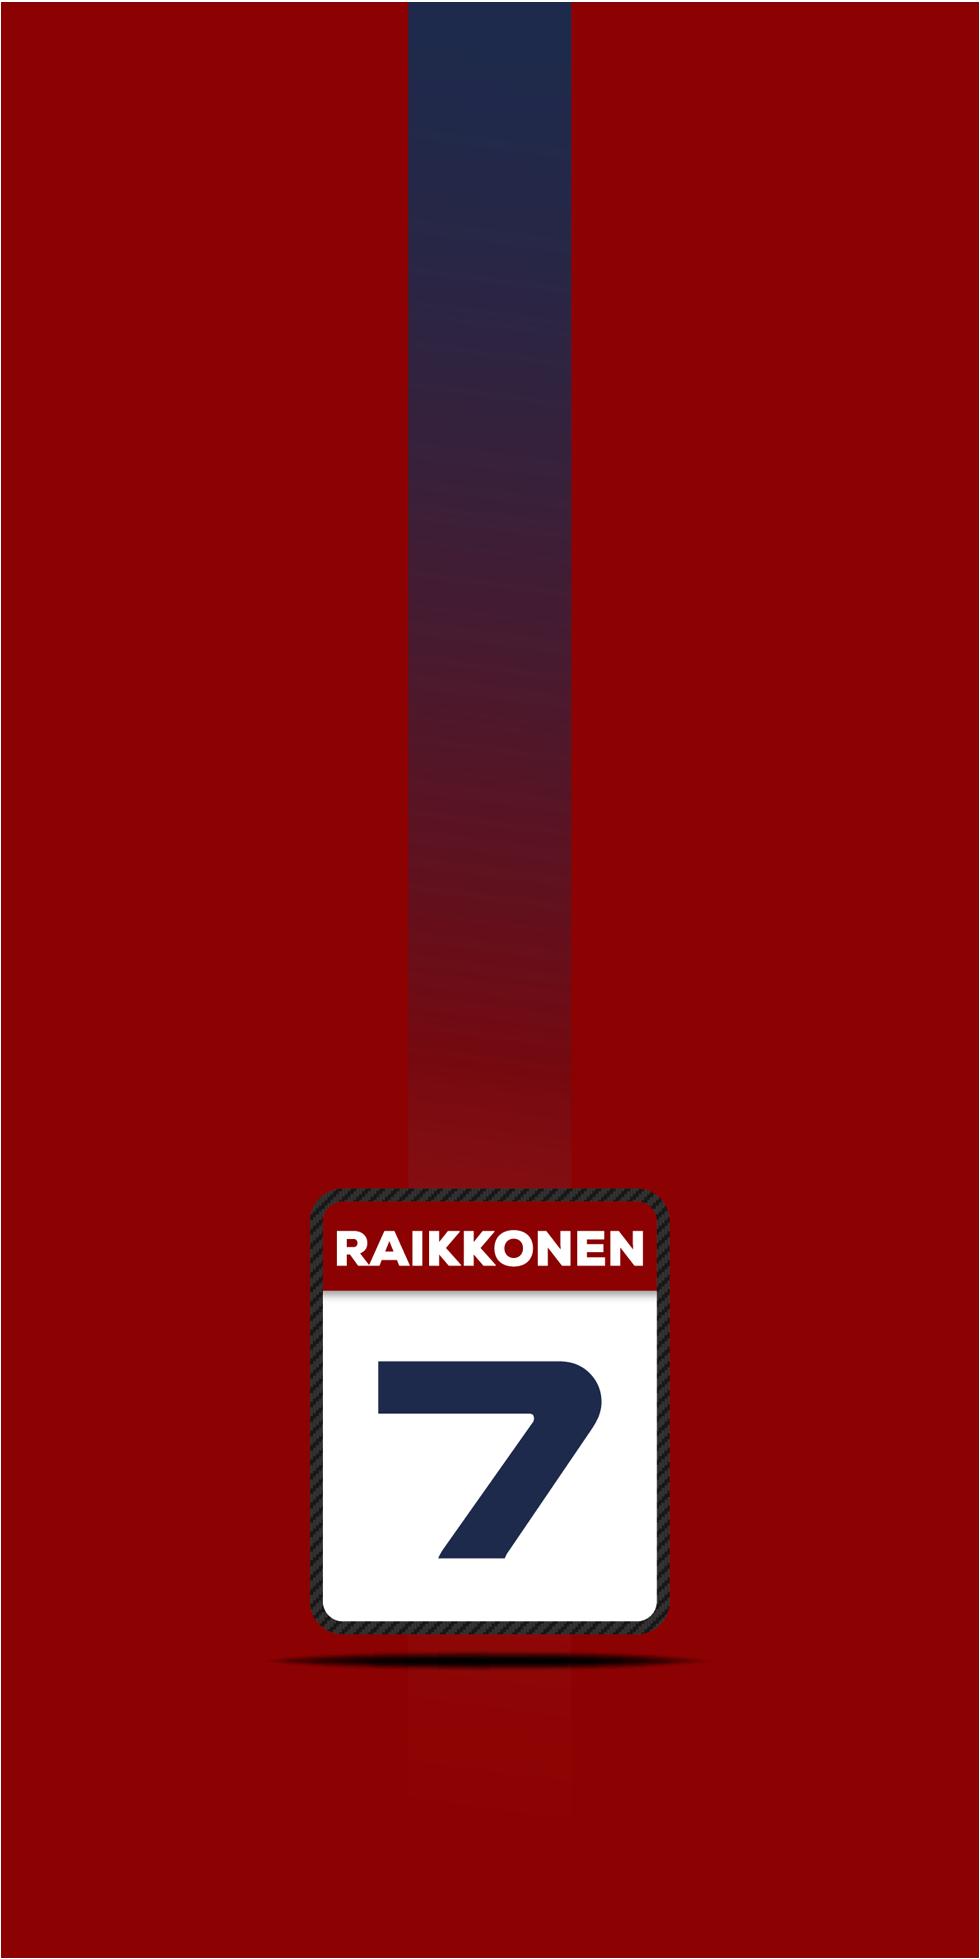 Kimi Raikkonen Wallpaper Posted By Ryan Peltier